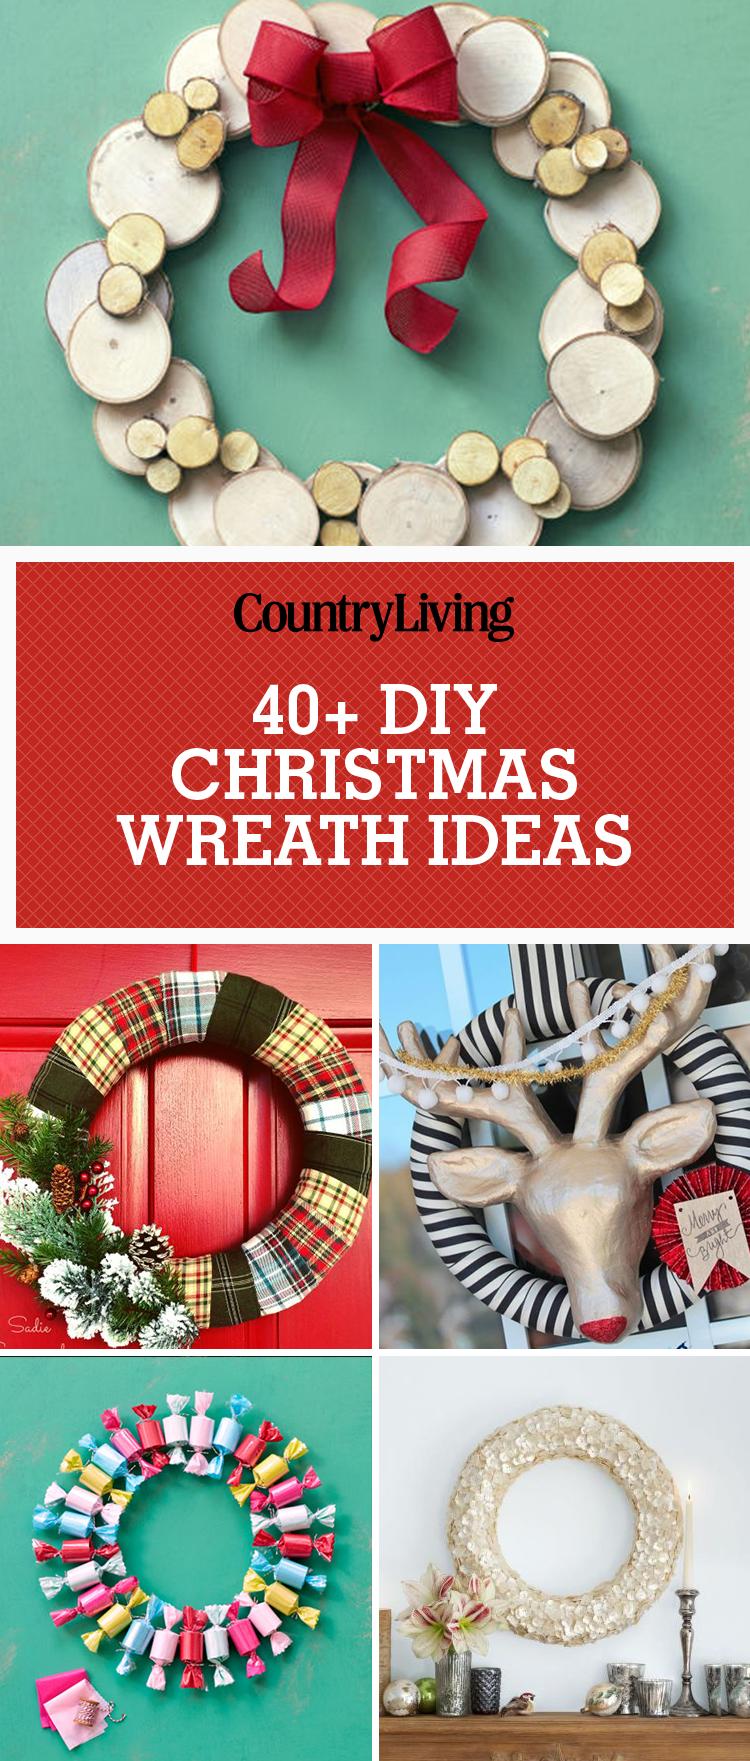 40+ DIY Christmas Wreath Ideas - How To Make Holiday ...